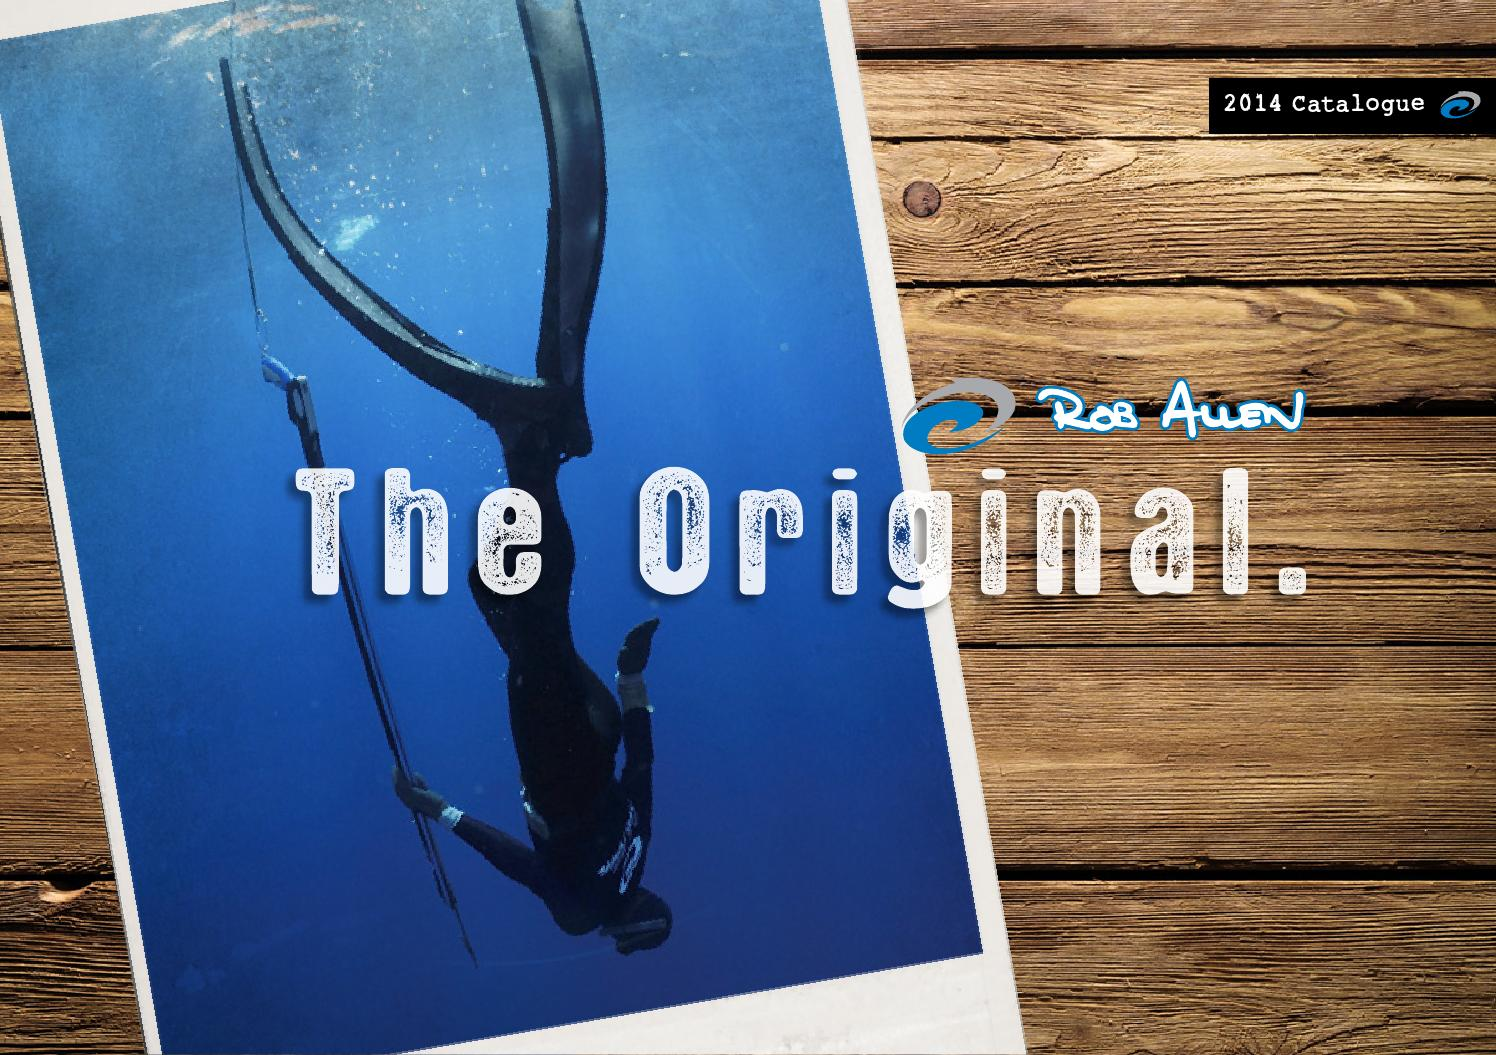 Rob Allen Scorpia Fins Size LG Long Fin Full Foot Freedive Snorkel Spearfishing